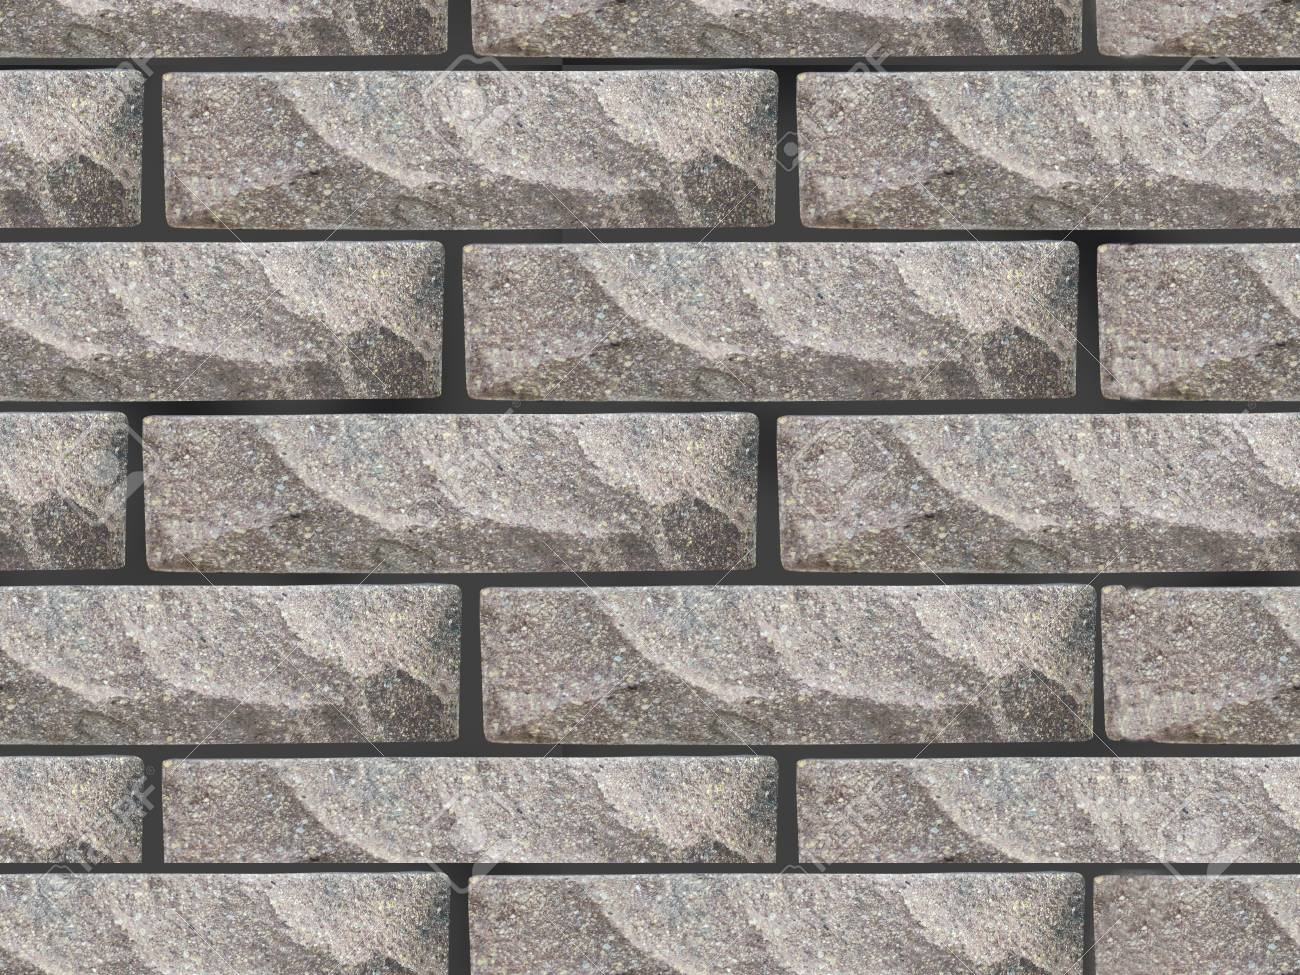 . Stone wall pattern  seamless brick texture  Wall made of natural